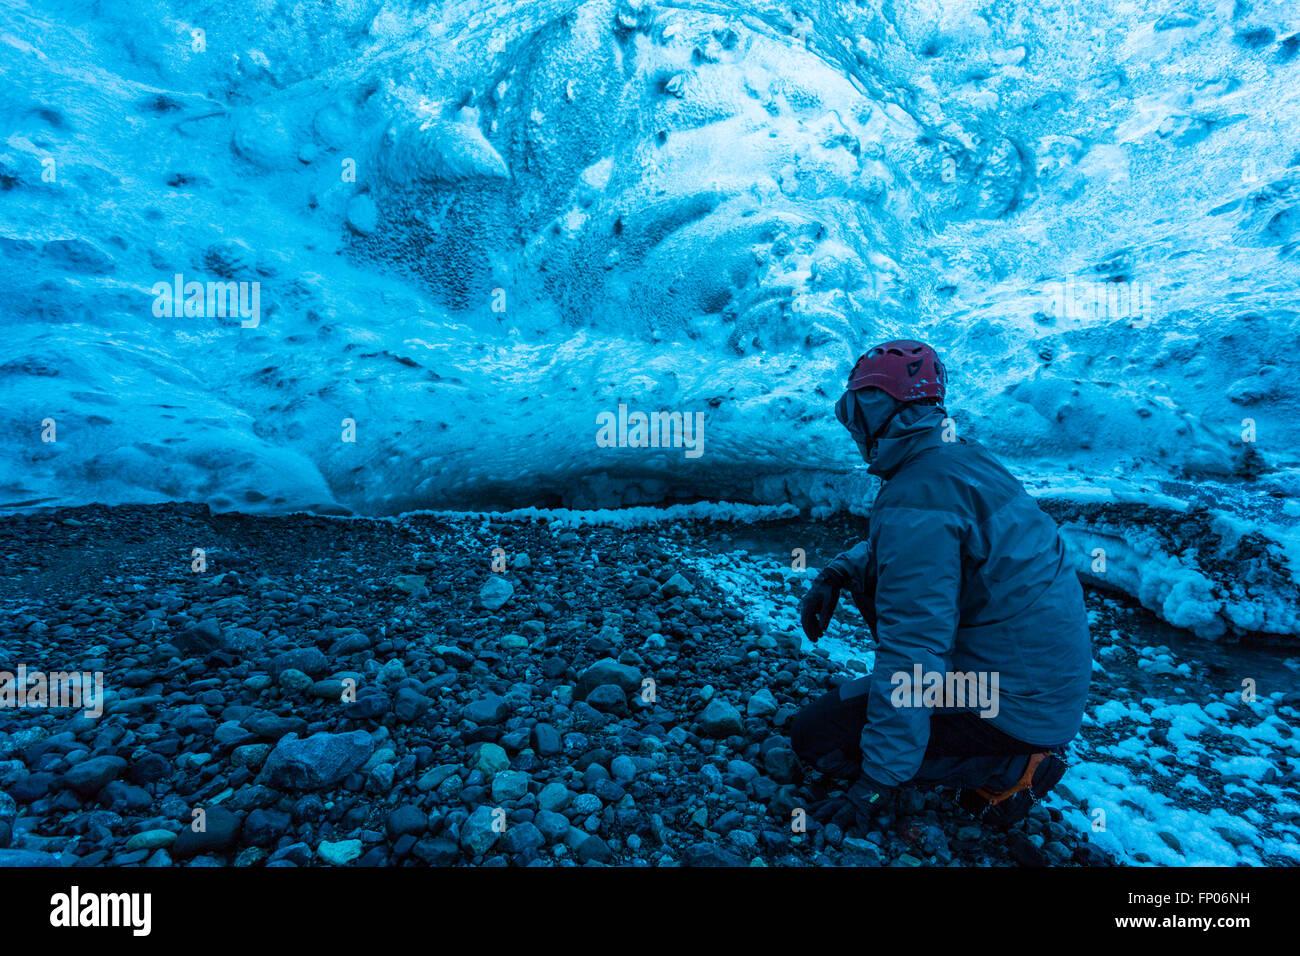 Man in an ice cave, Vatnajökull Nationalpark, Glacier, Iceland - Stock Image